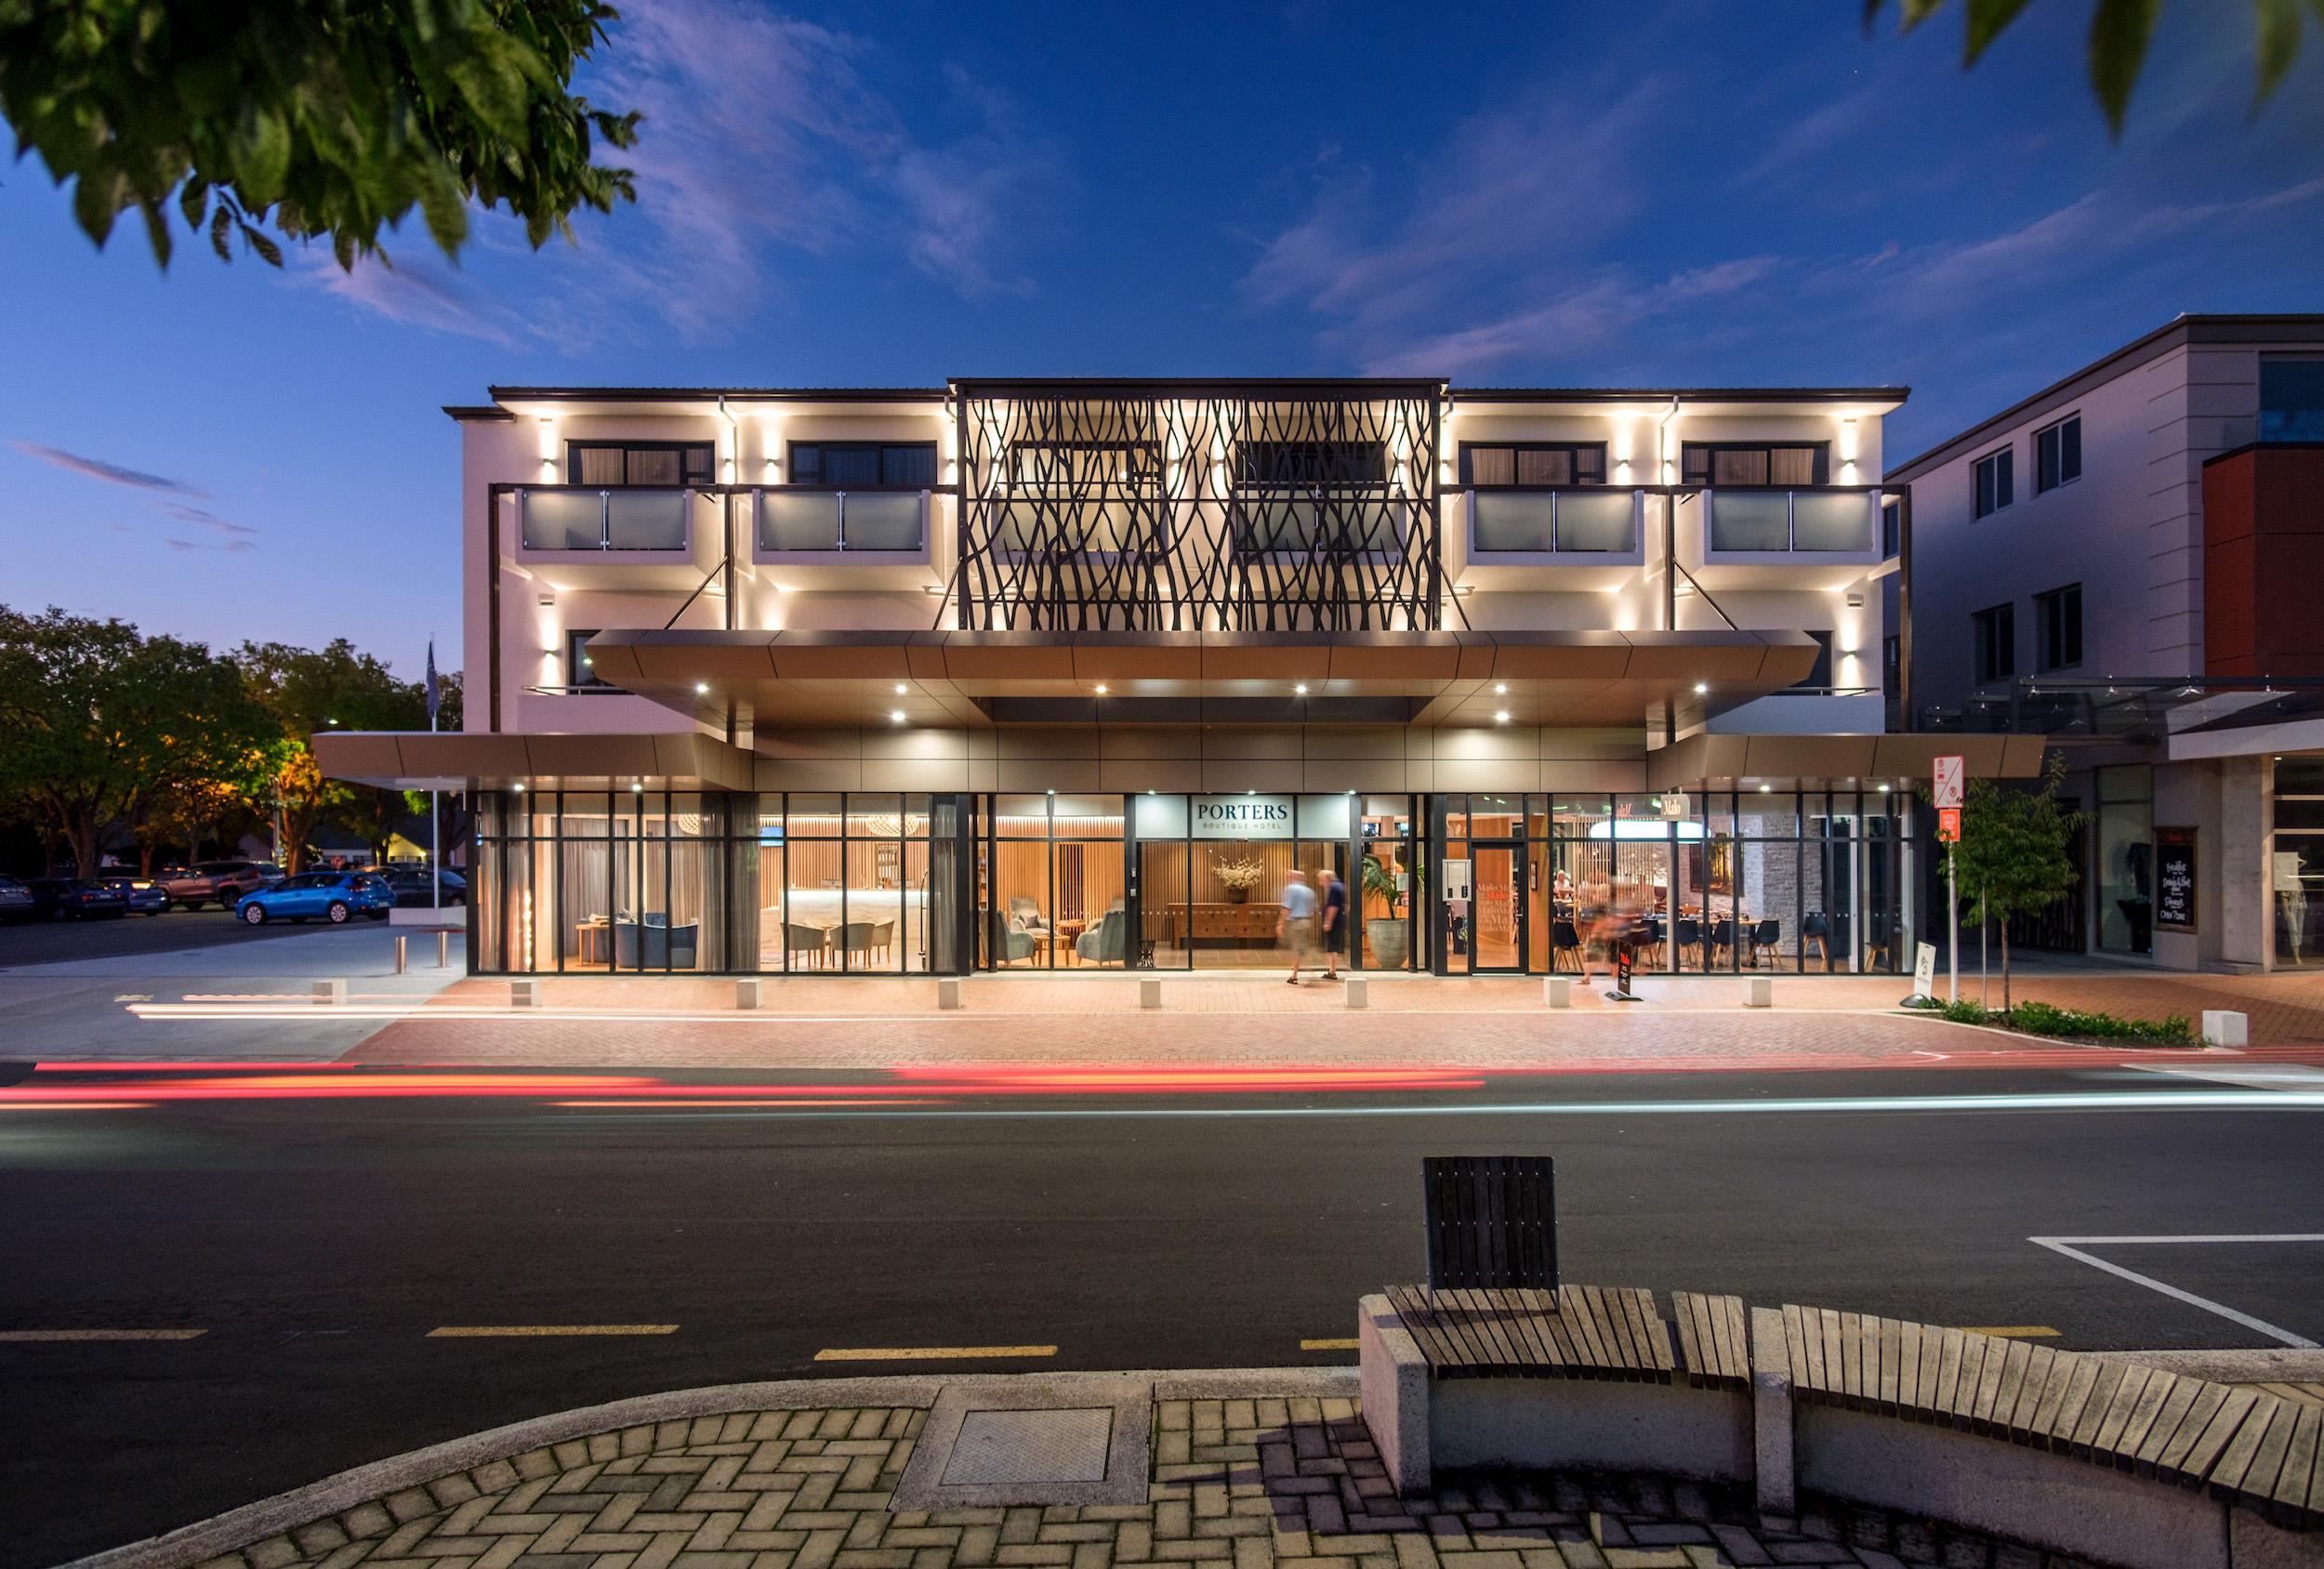 Porters Hotel, Havelock North